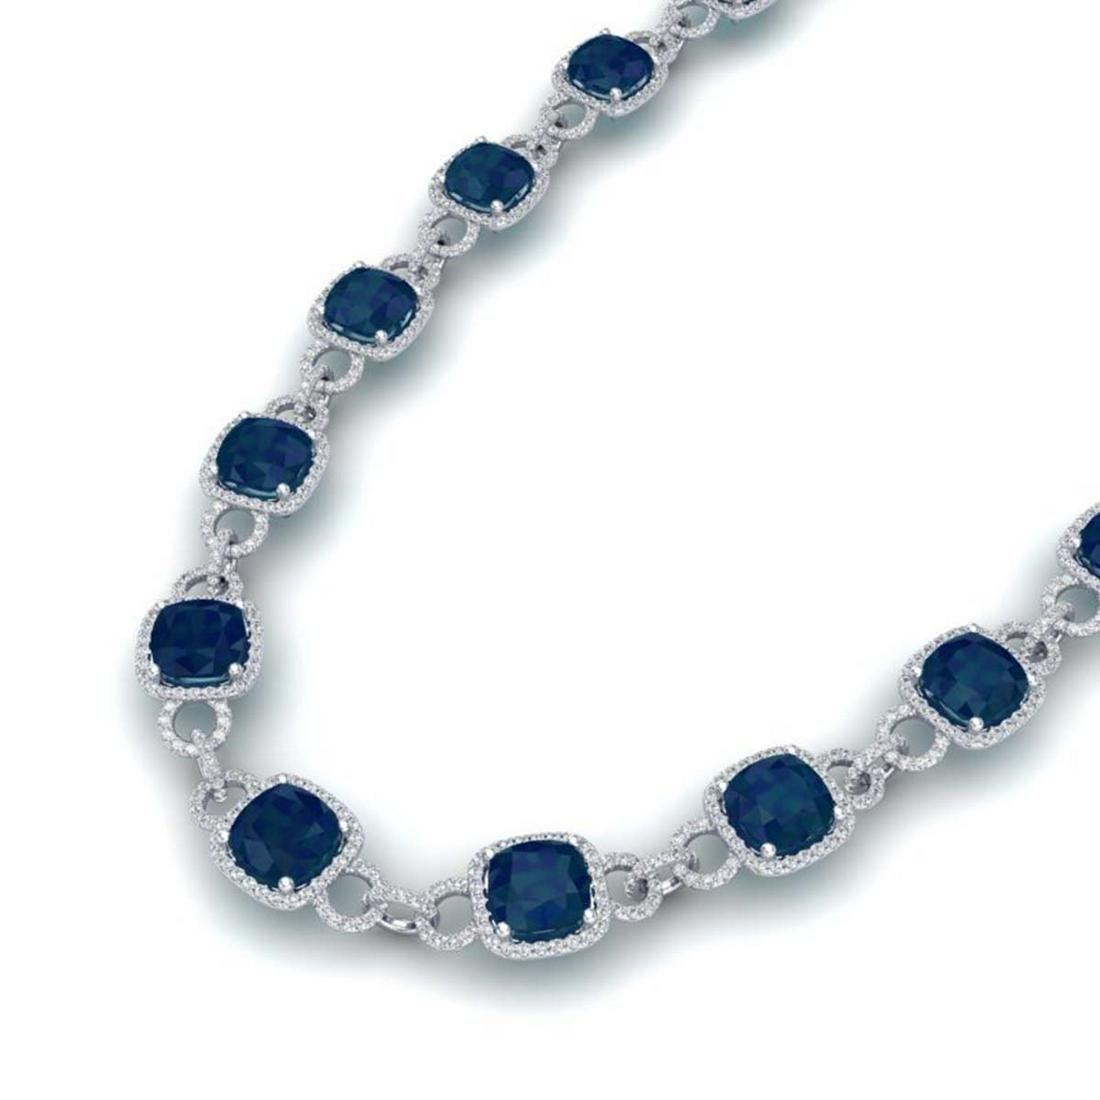 56 ctw Sapphire & VS/SI Diamond Necklace 14K White Gold